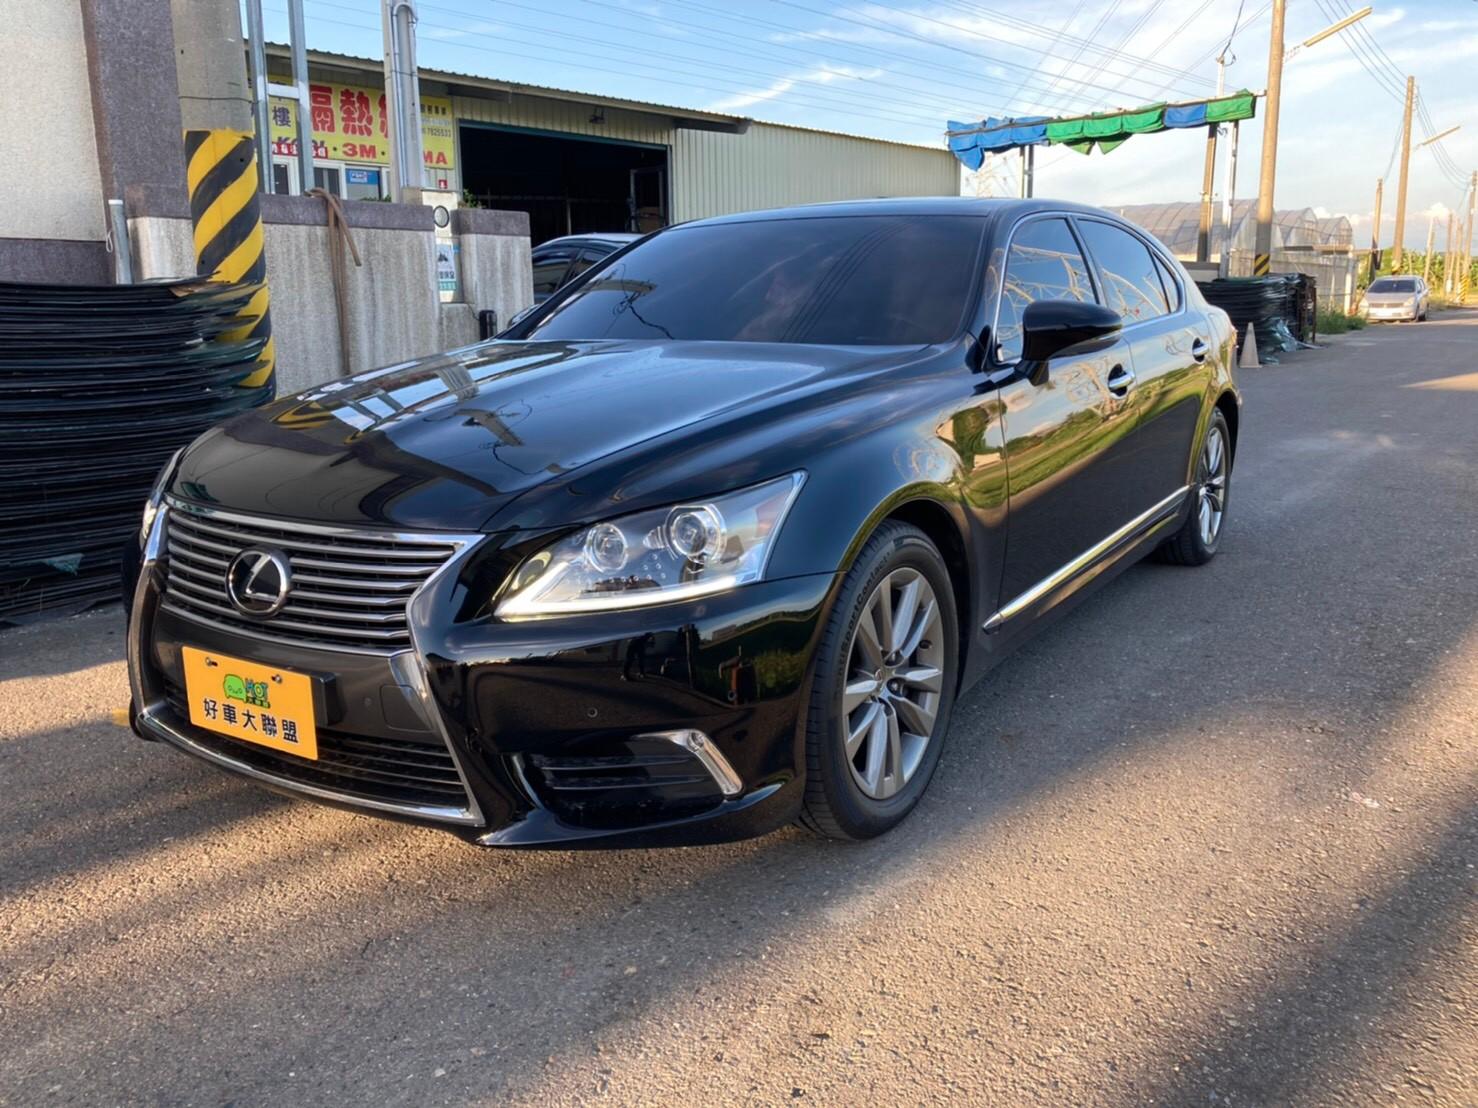 2014 Lexus 凌志 Ls